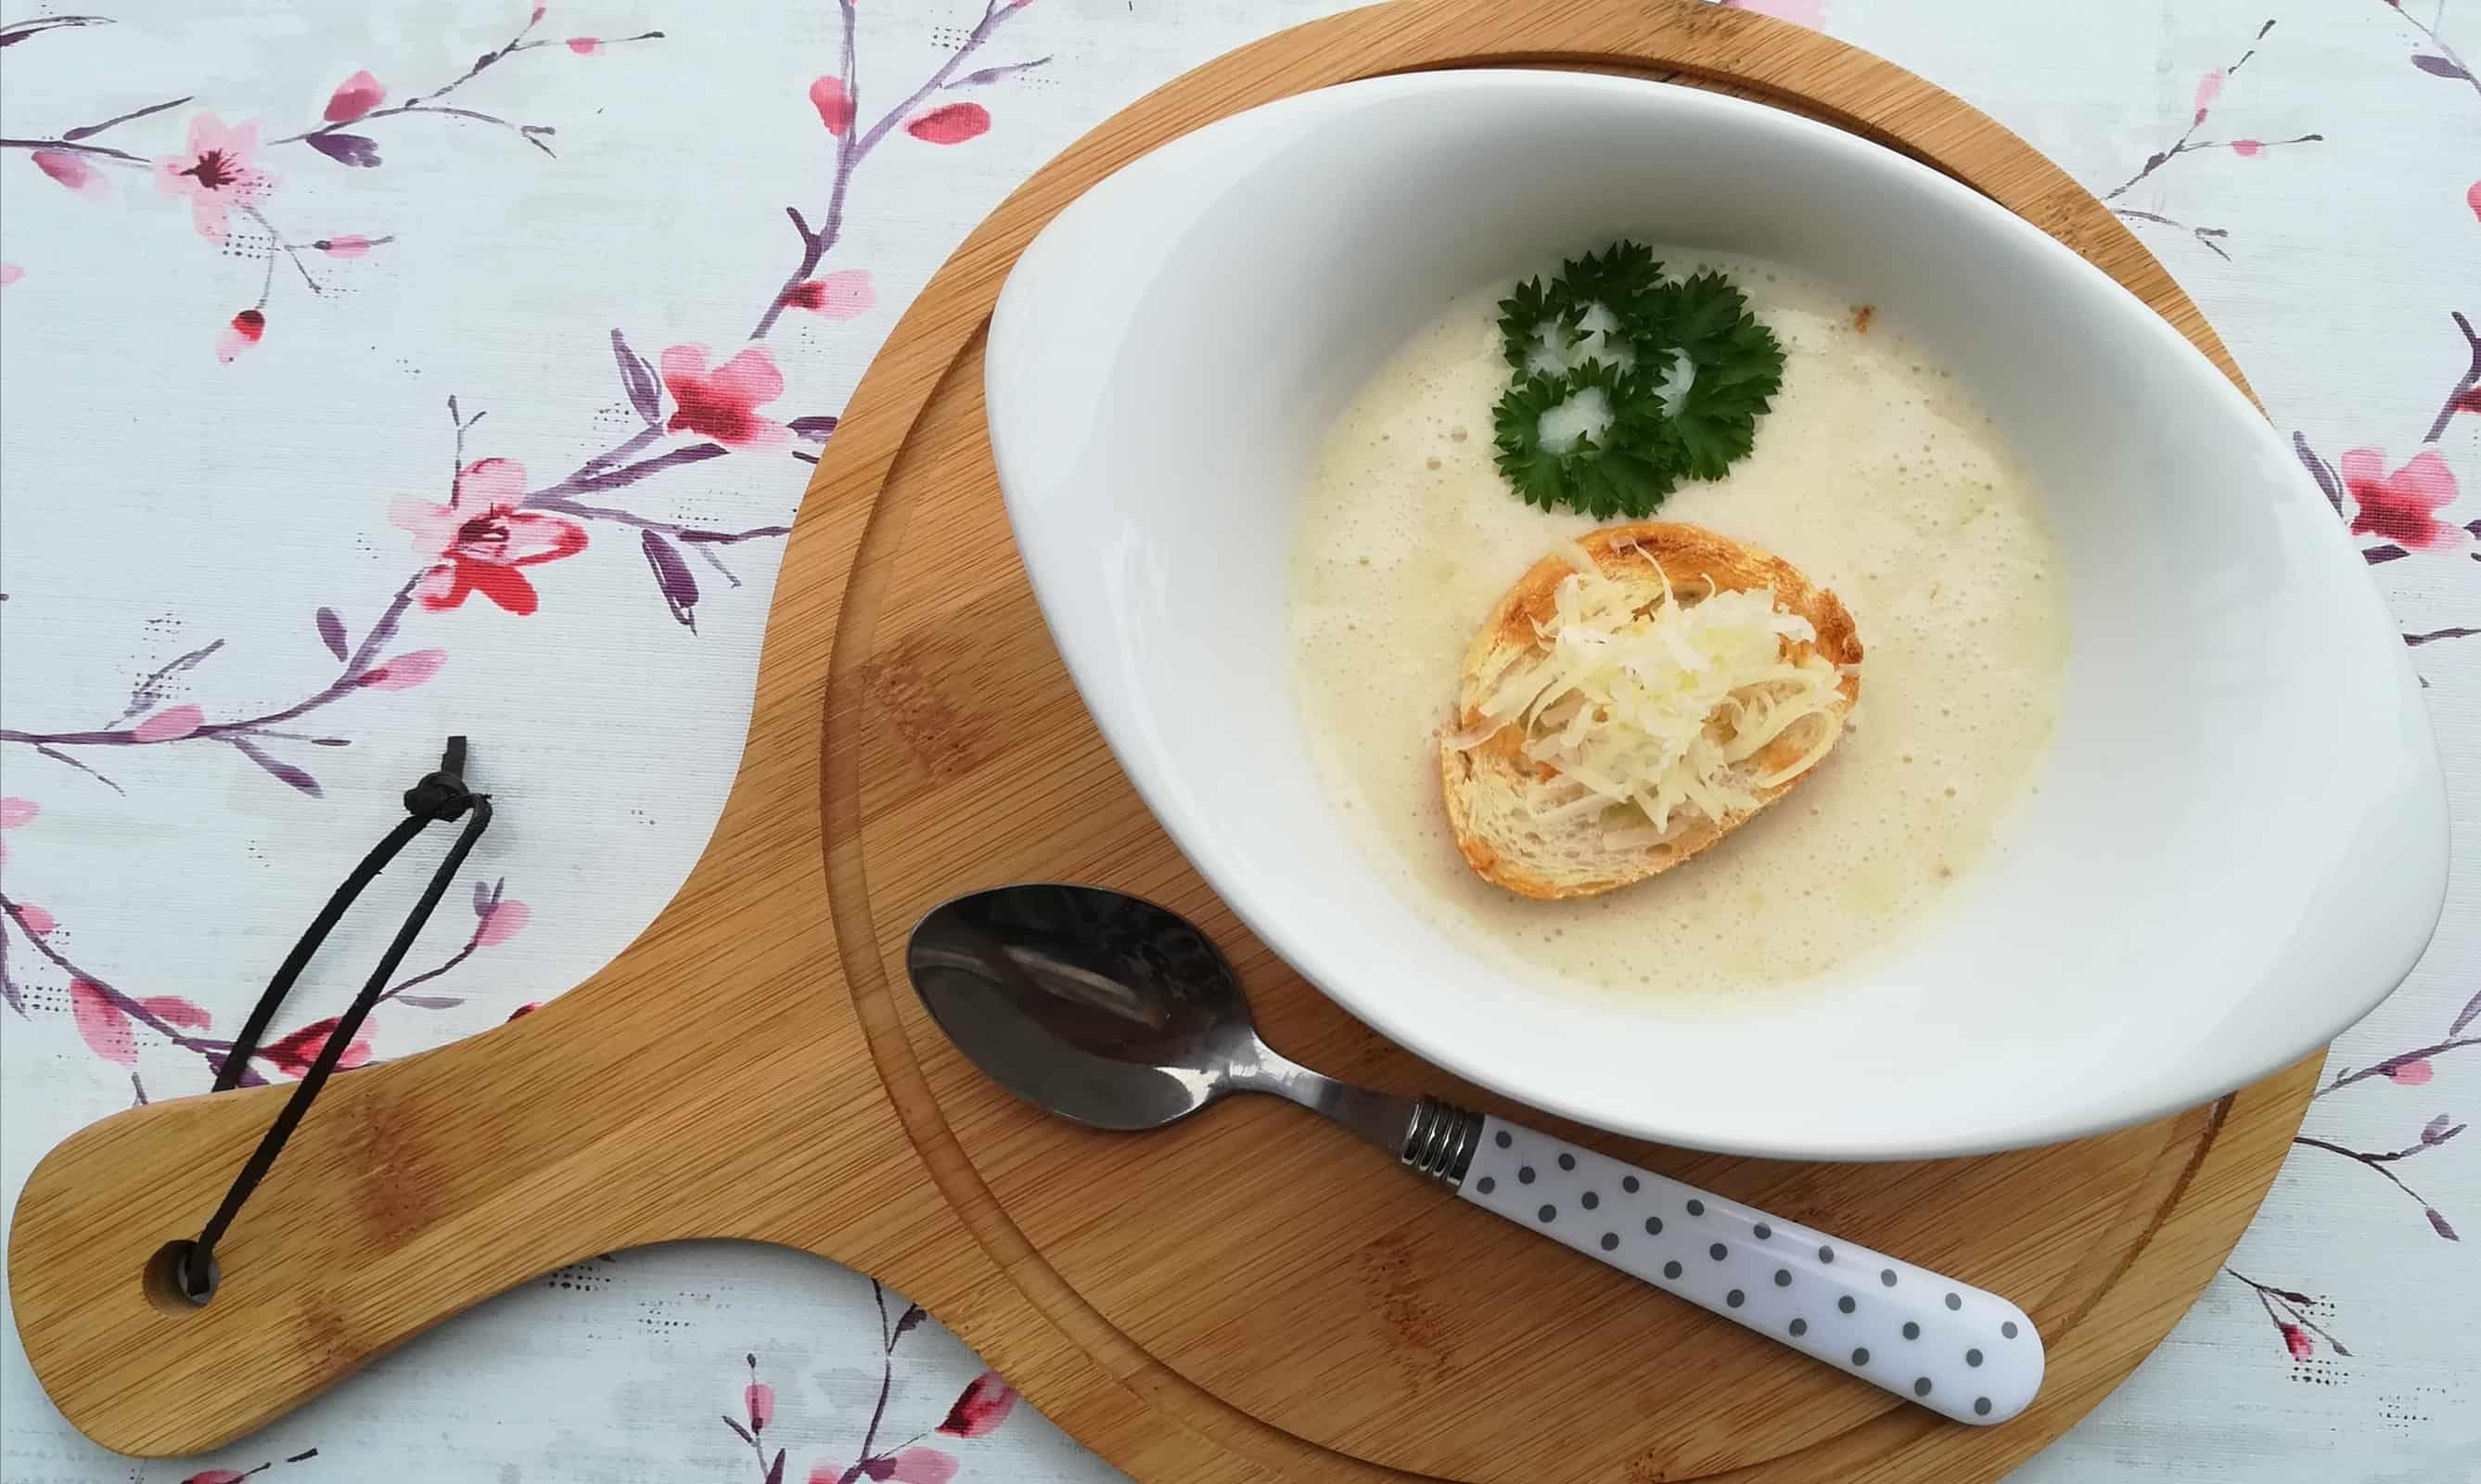 Krémová cesnaková polievka s ovsenými vločkami